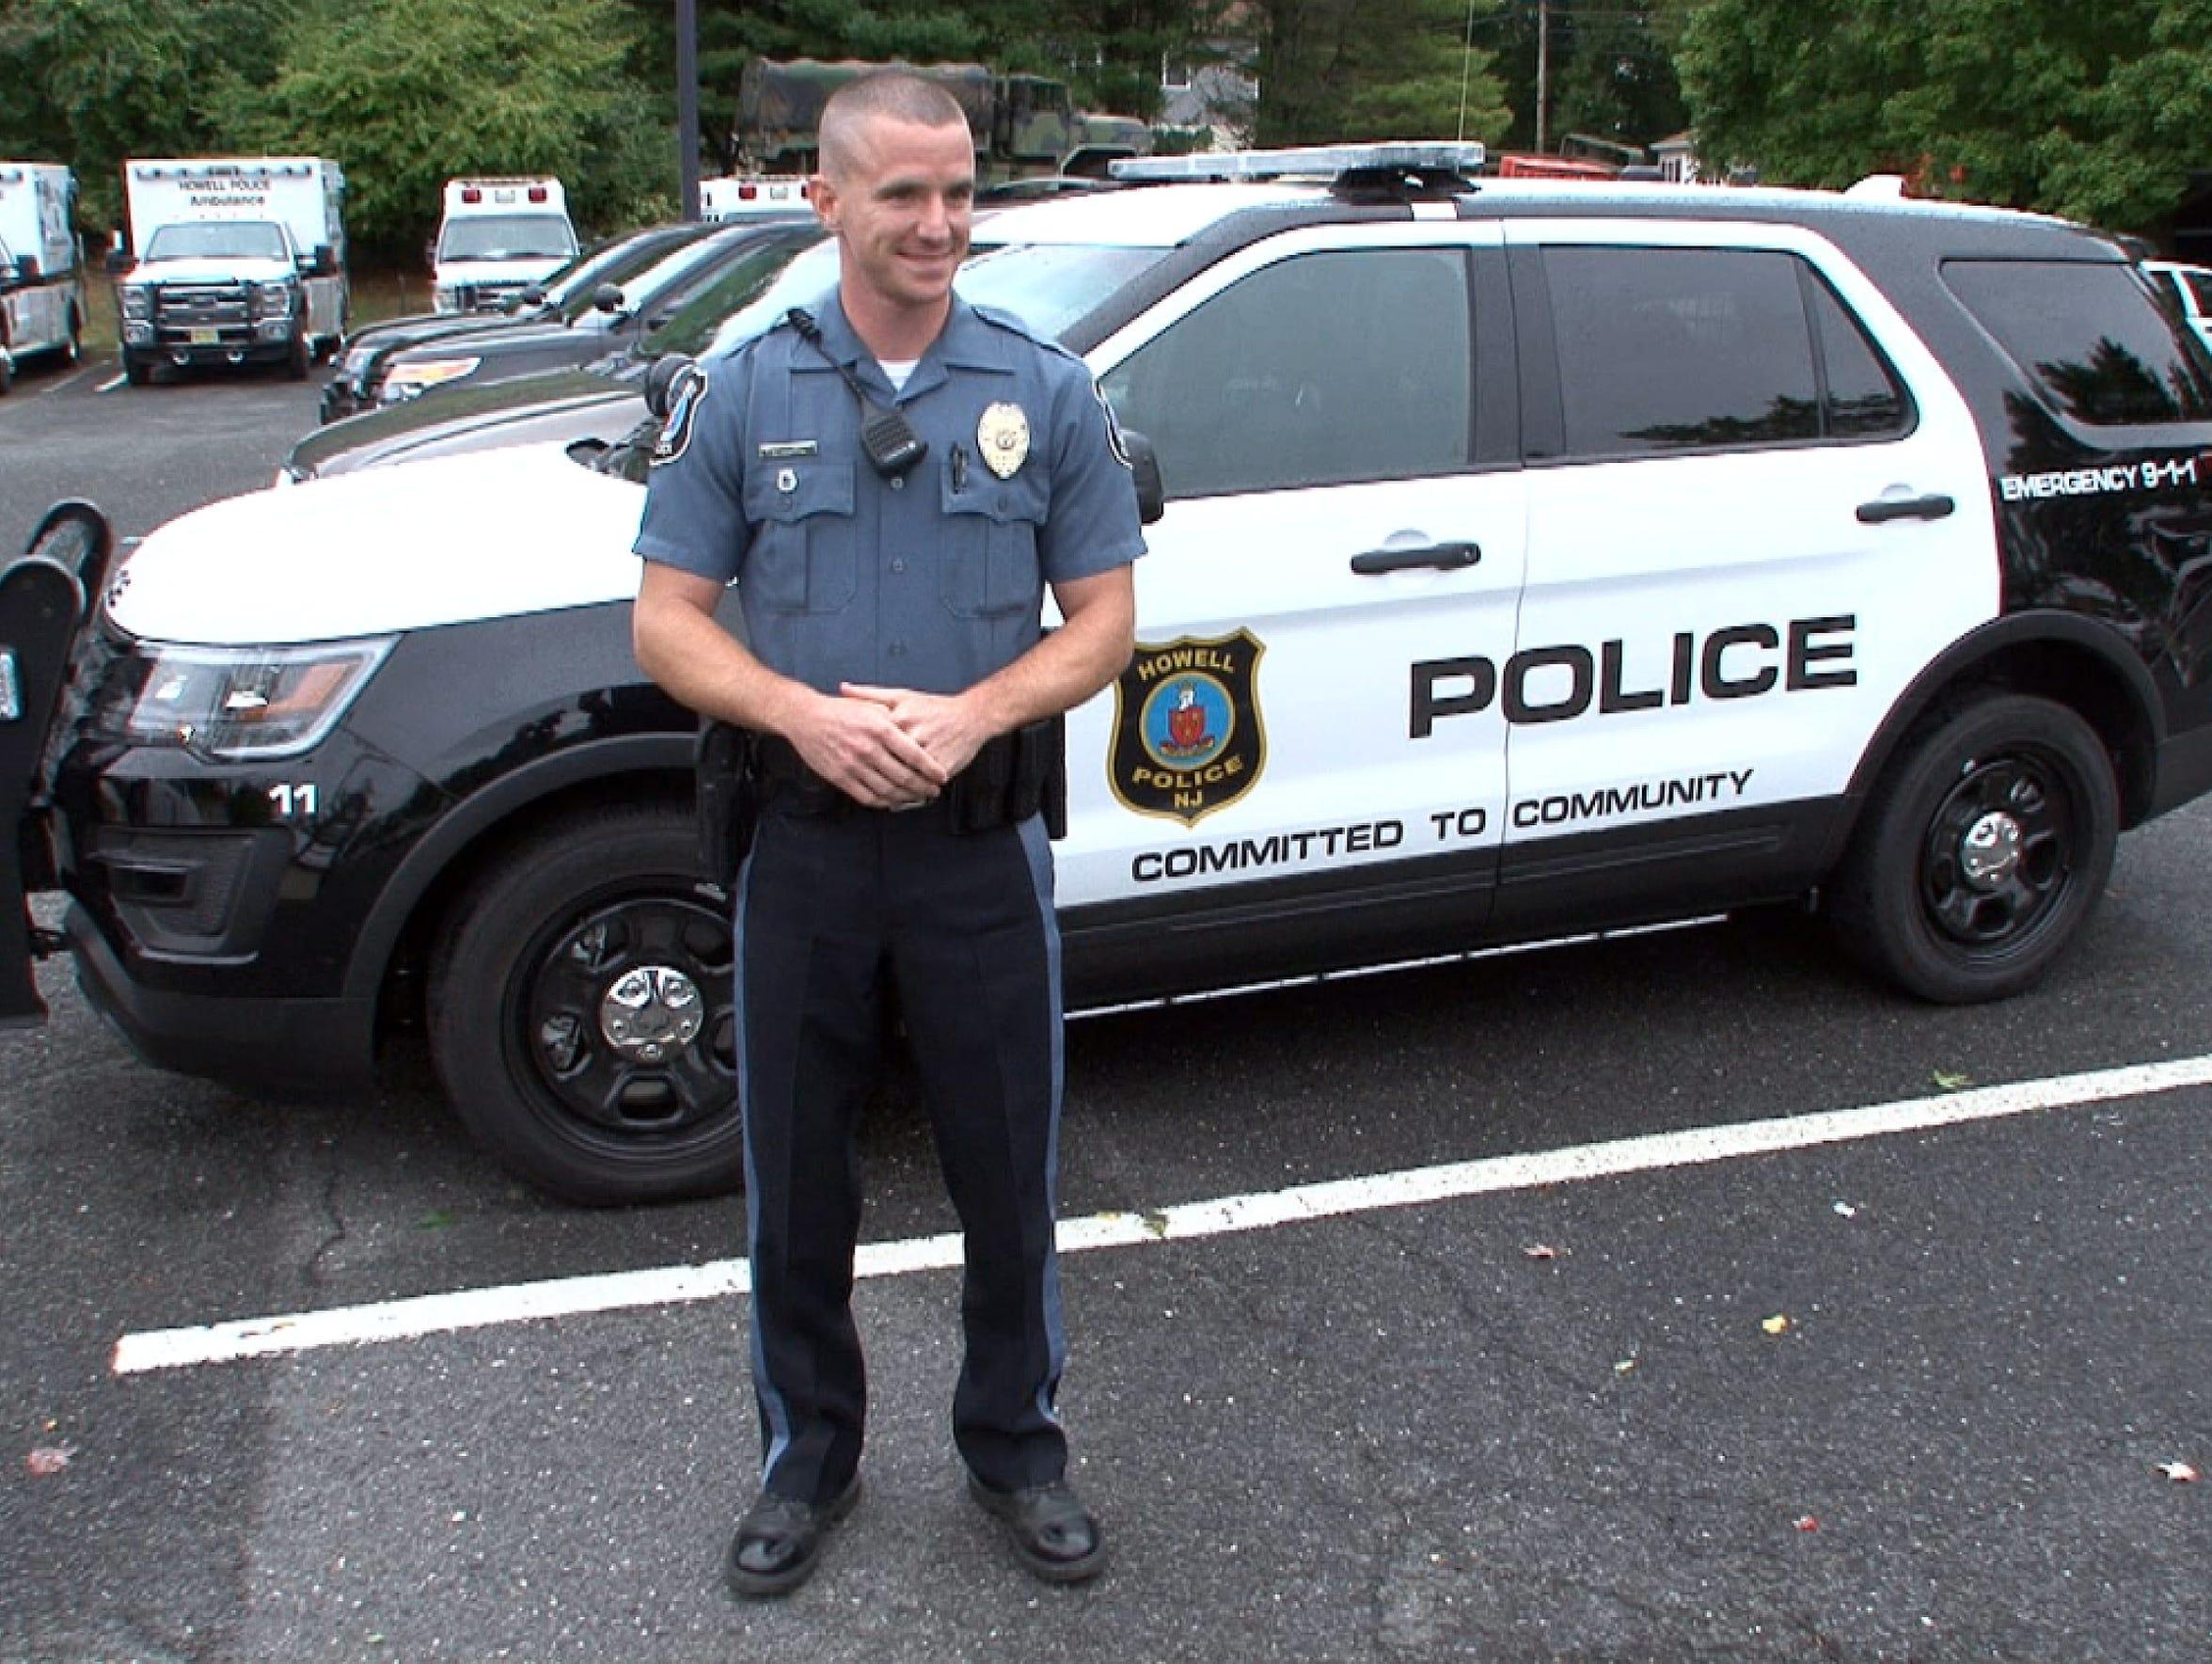 Howell Township Patrolman Nicholas Austin